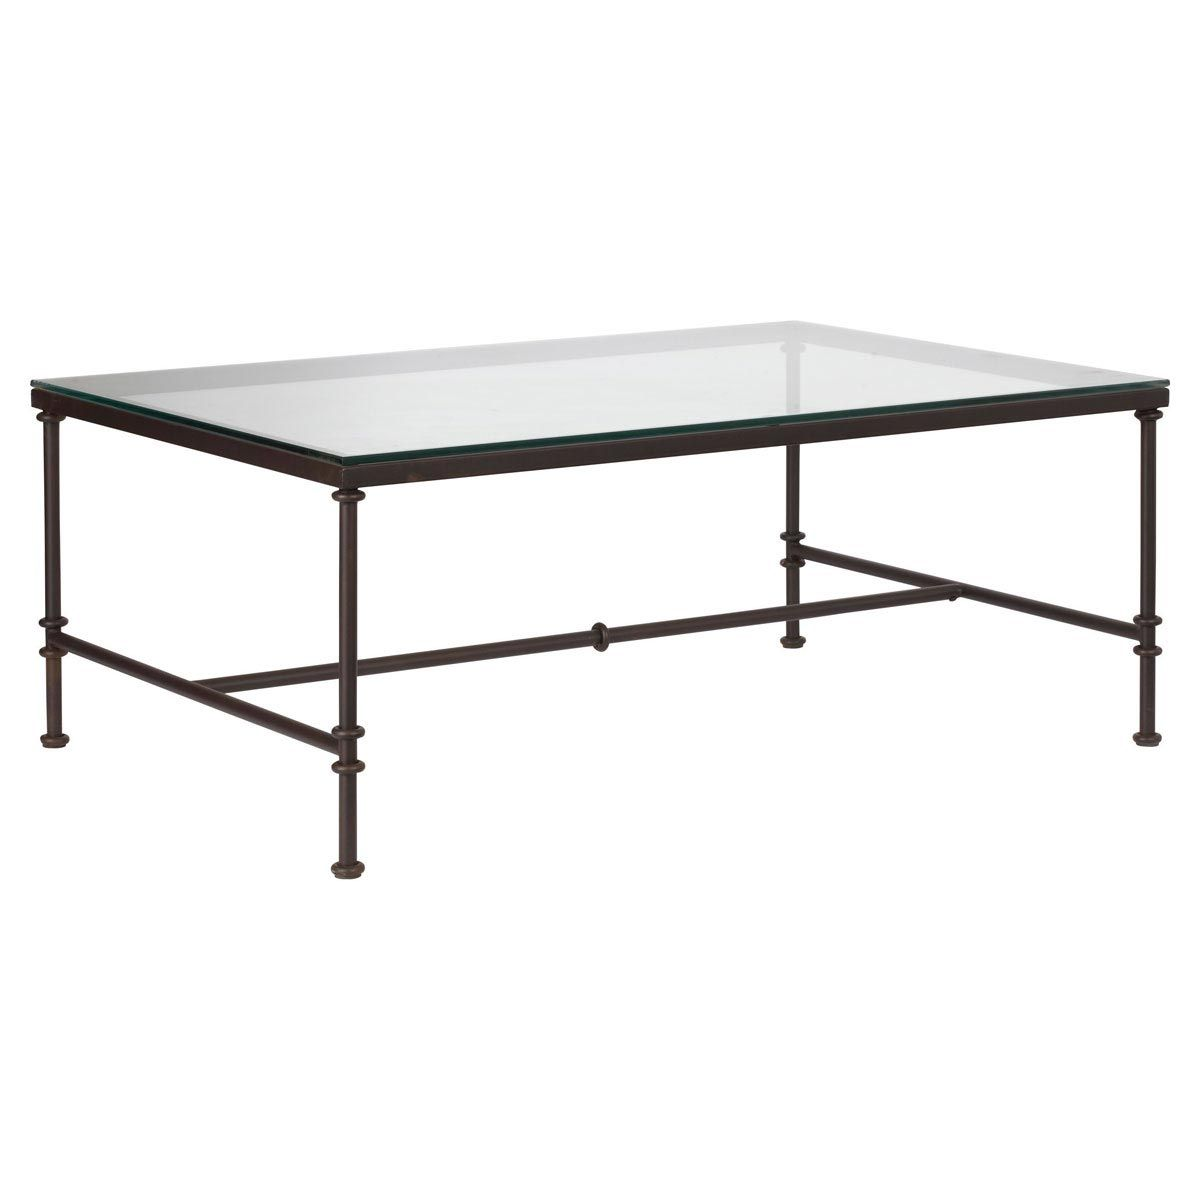 Pompidou Metal Glass Coffee Table Small Glass Coffee Table Iron Coffee Table Metal Coffee Table [ 1200 x 1200 Pixel ]